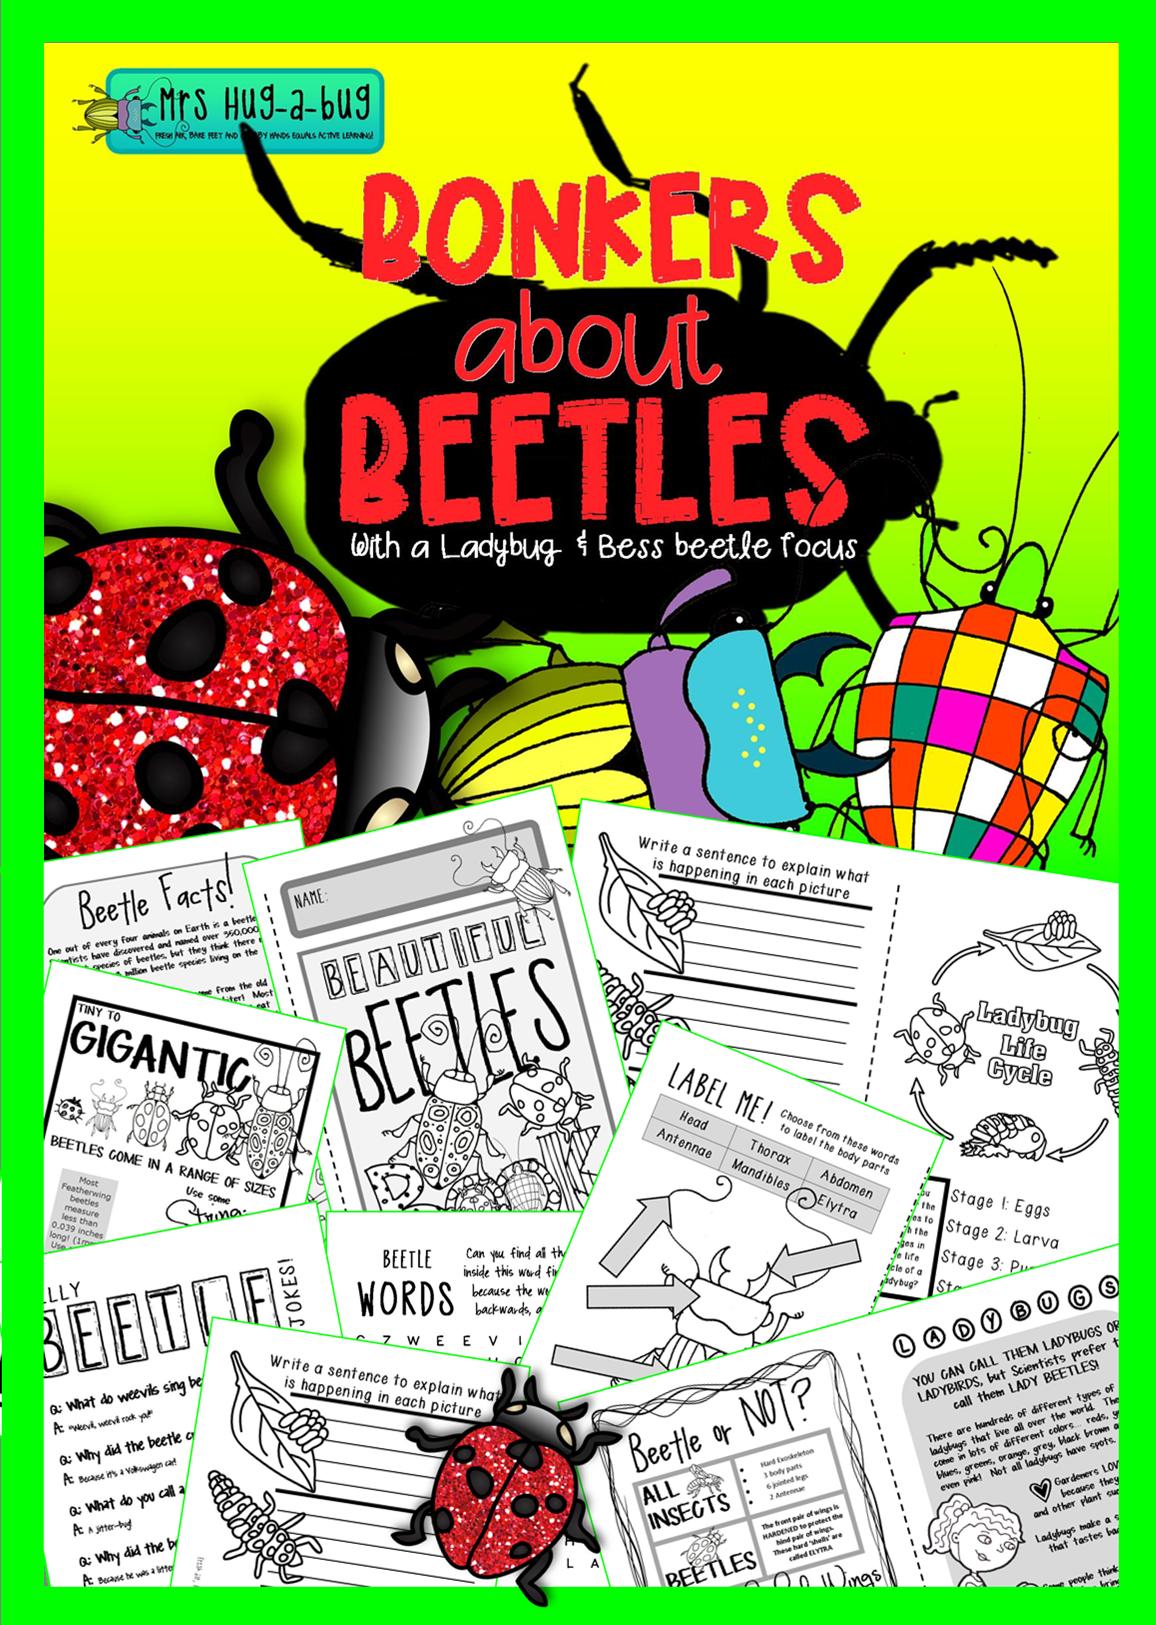 Beetles Ladybugs Amp Bess Beetles A Booklet Celebrating